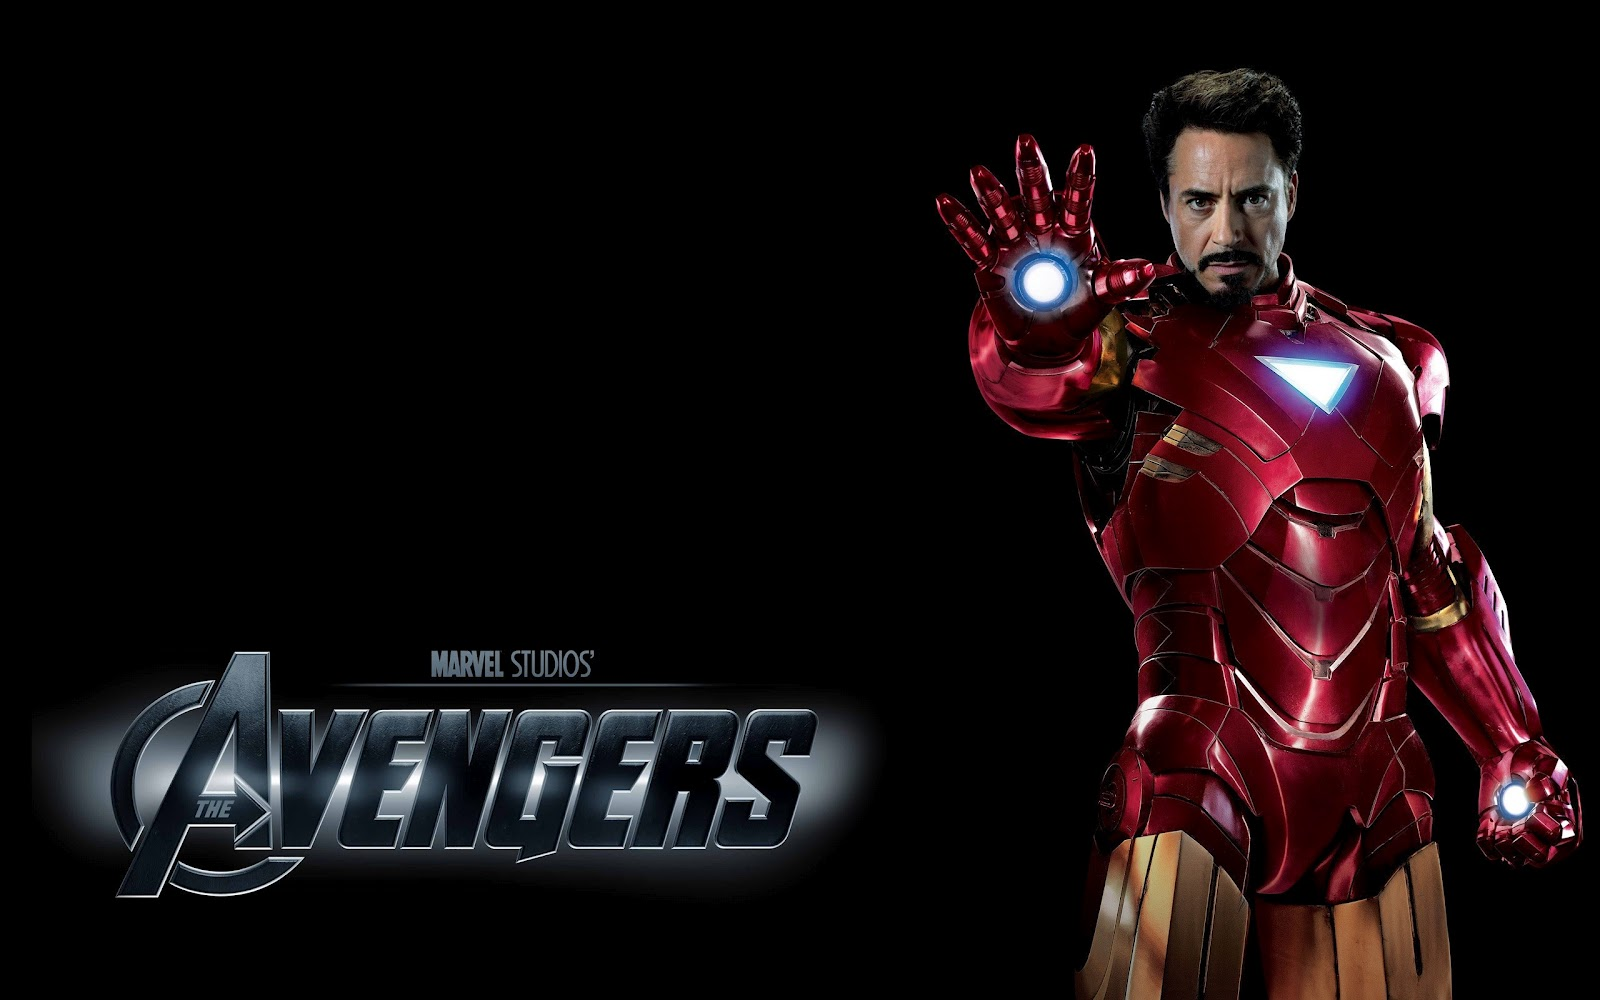 http://4.bp.blogspot.com/-sj7G6EgBa9c/T5aqwf5Sl5I/AAAAAAAABsk/cIHvX2ReYSQ/s1600/the-avengers-iron-man-+avengers-hd-wallpaper.jpg